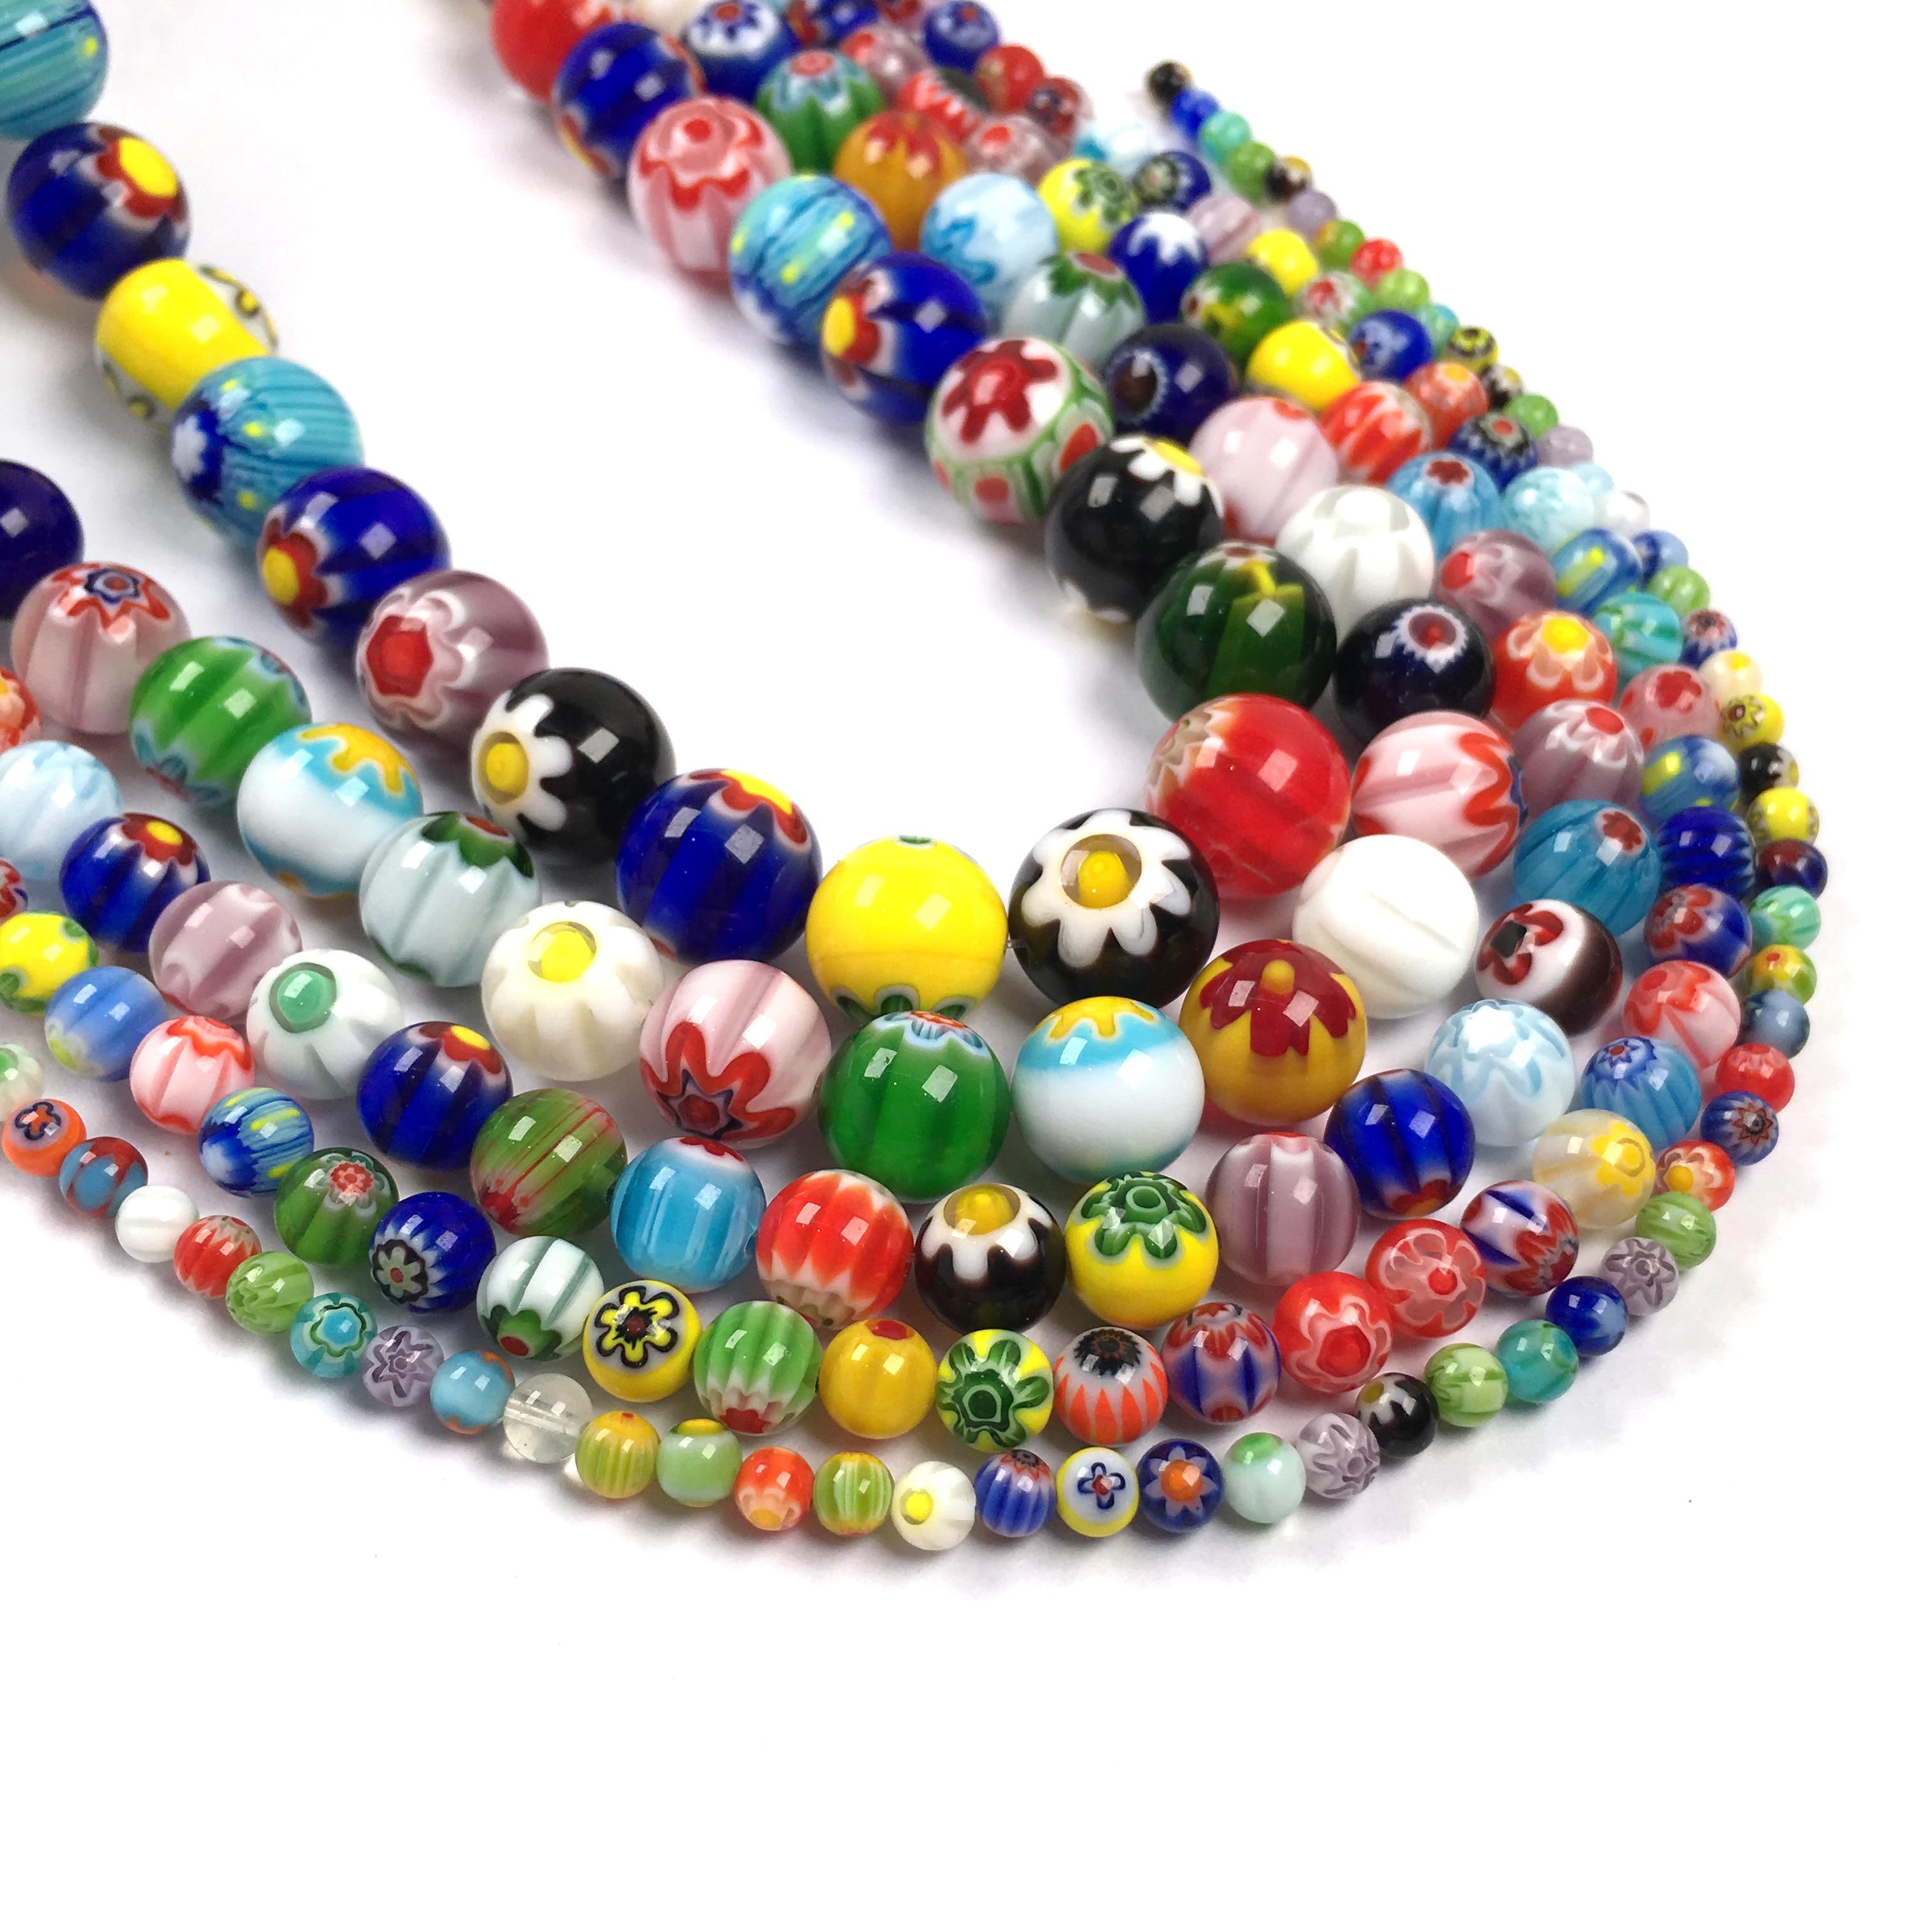 Women Jewelry Making Beads Glass Spacer Bulk Balls DIY Bracelet Necklace Bead